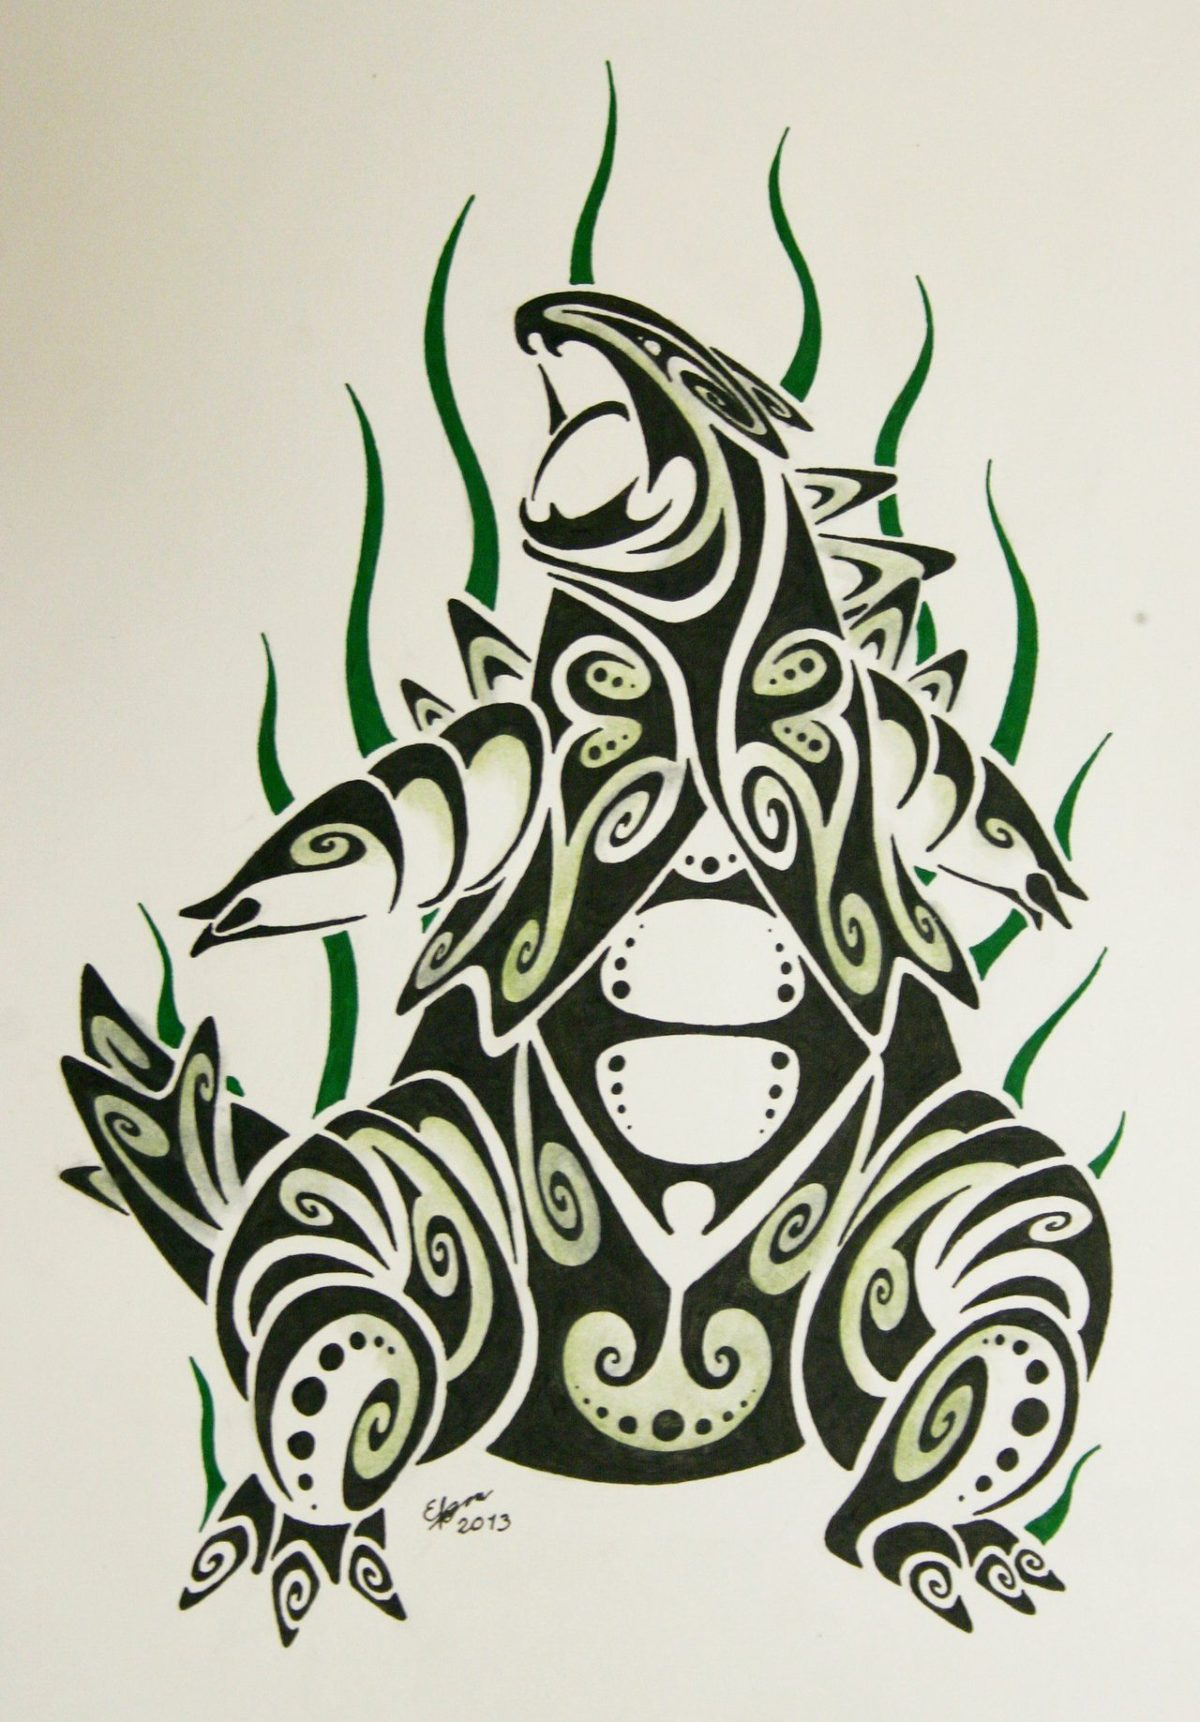 Tribal tyranitar by Esmeekramer on DeviantArt